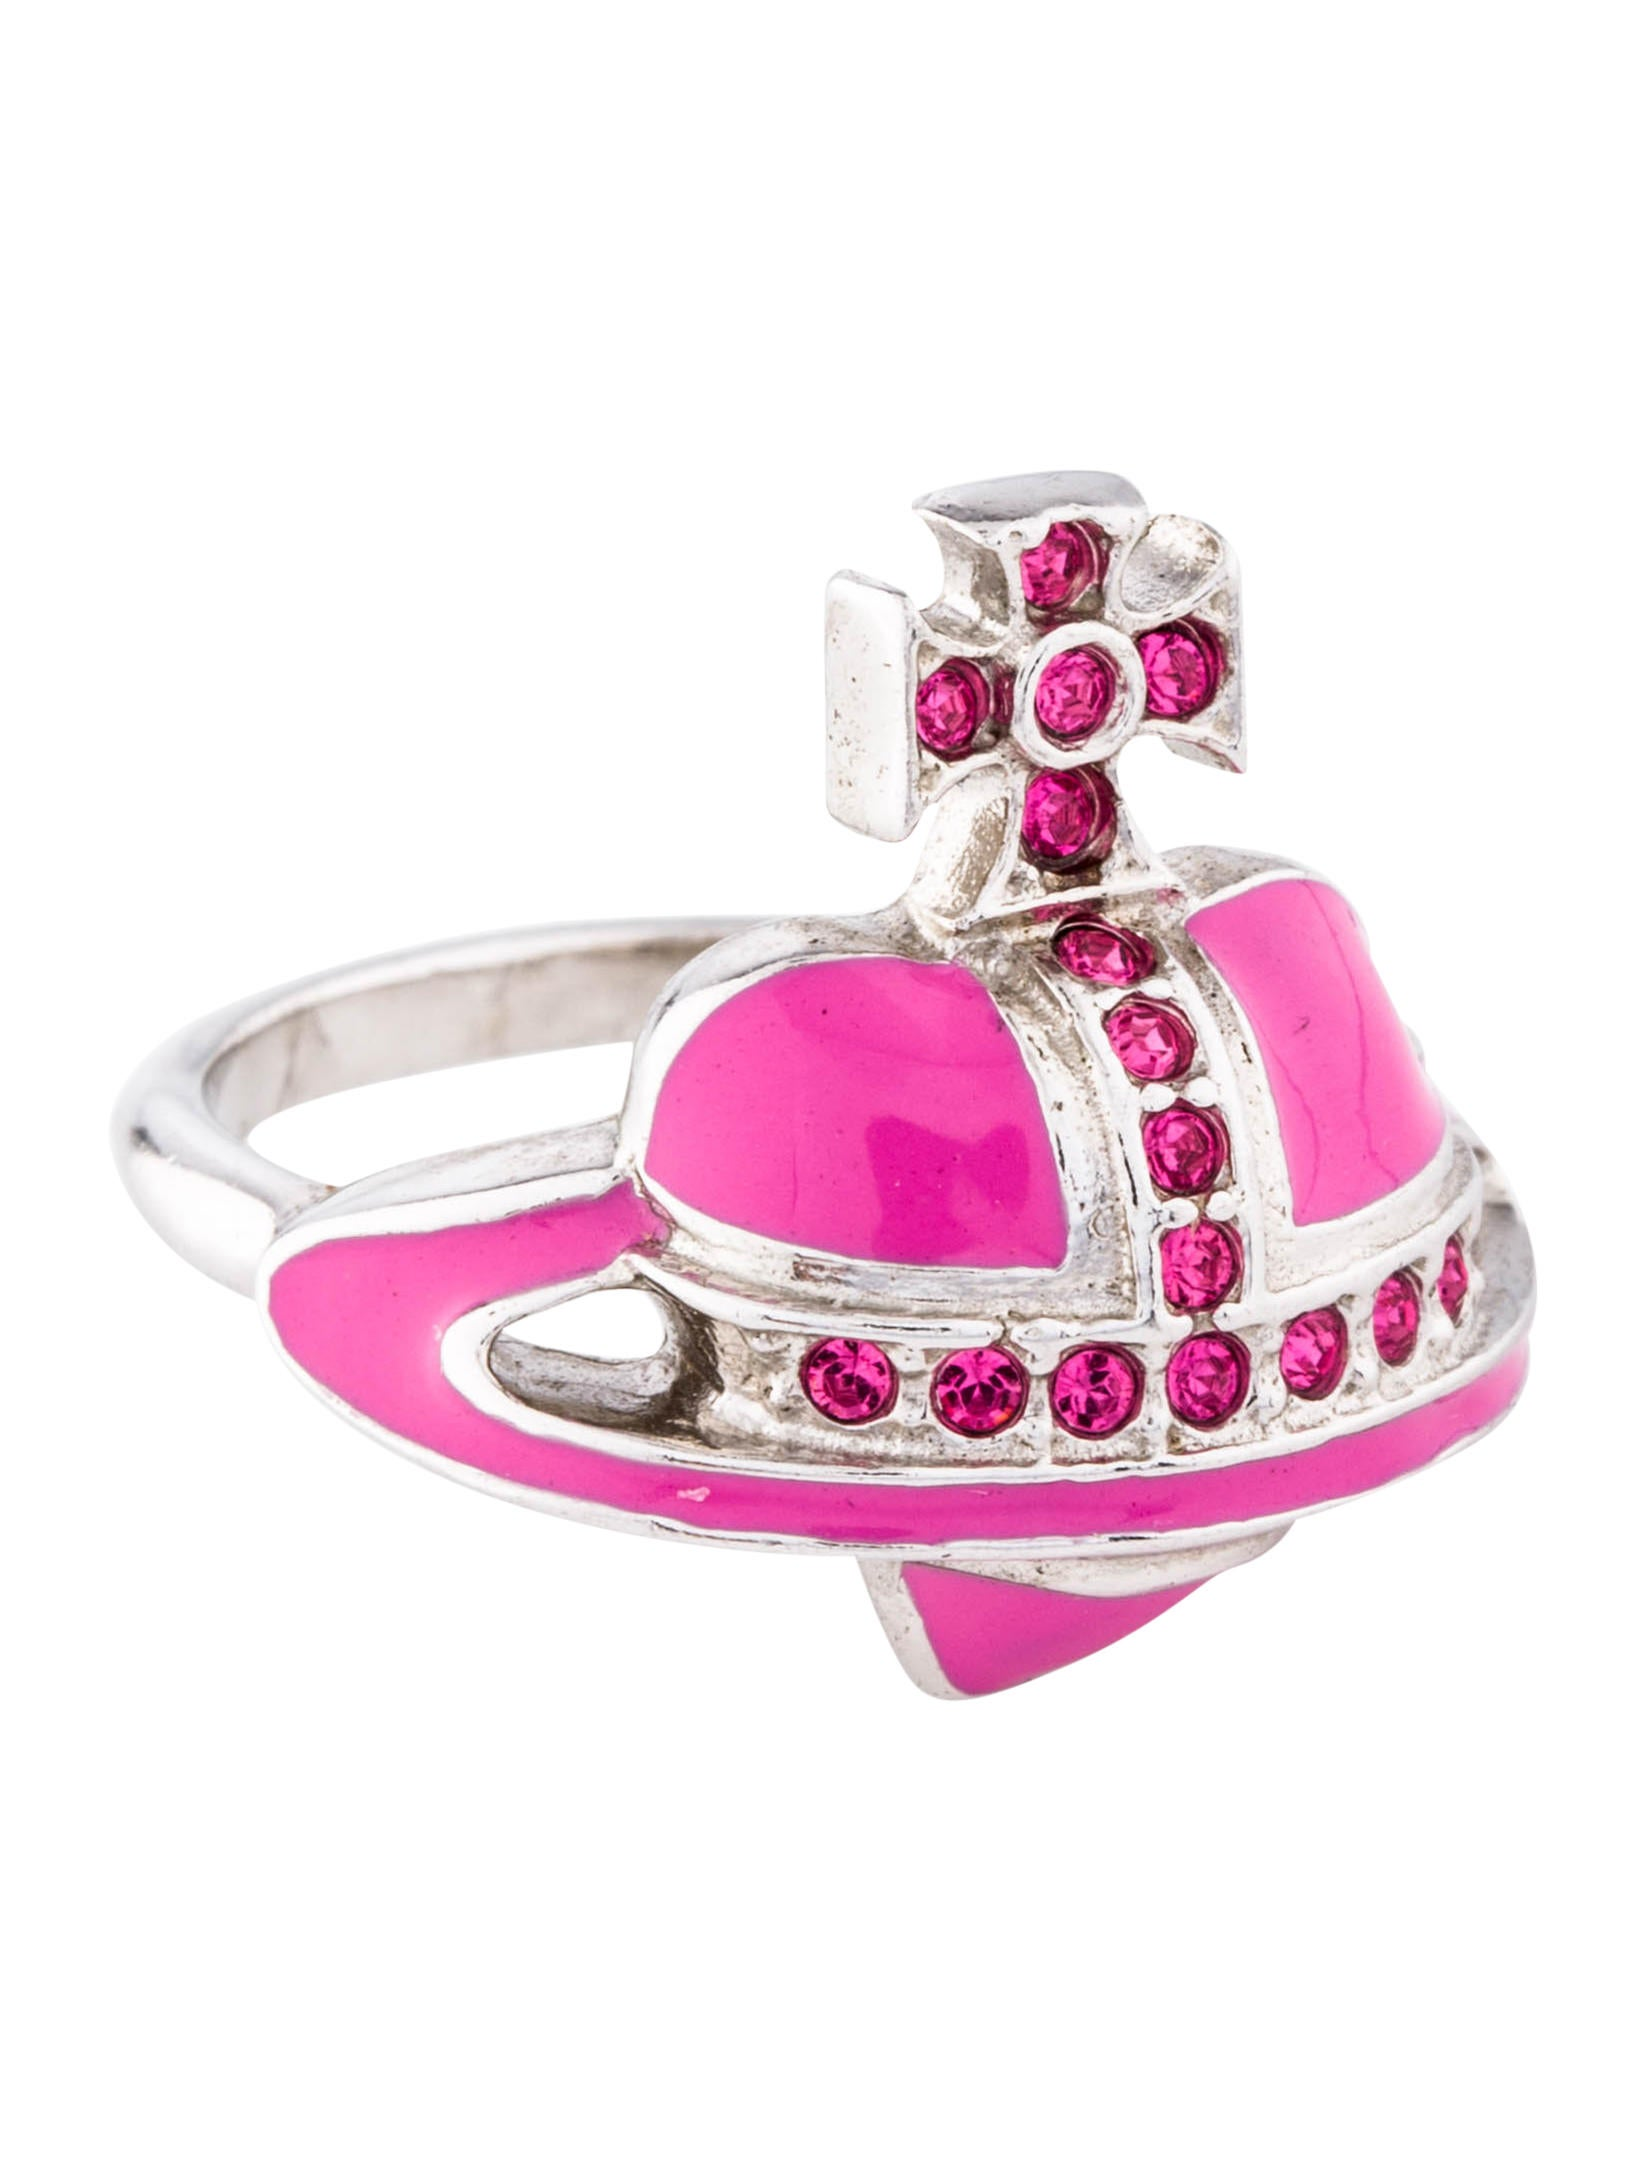 Vivienne Westwood Orb Ring - Rings - VIV22686 | The RealReal